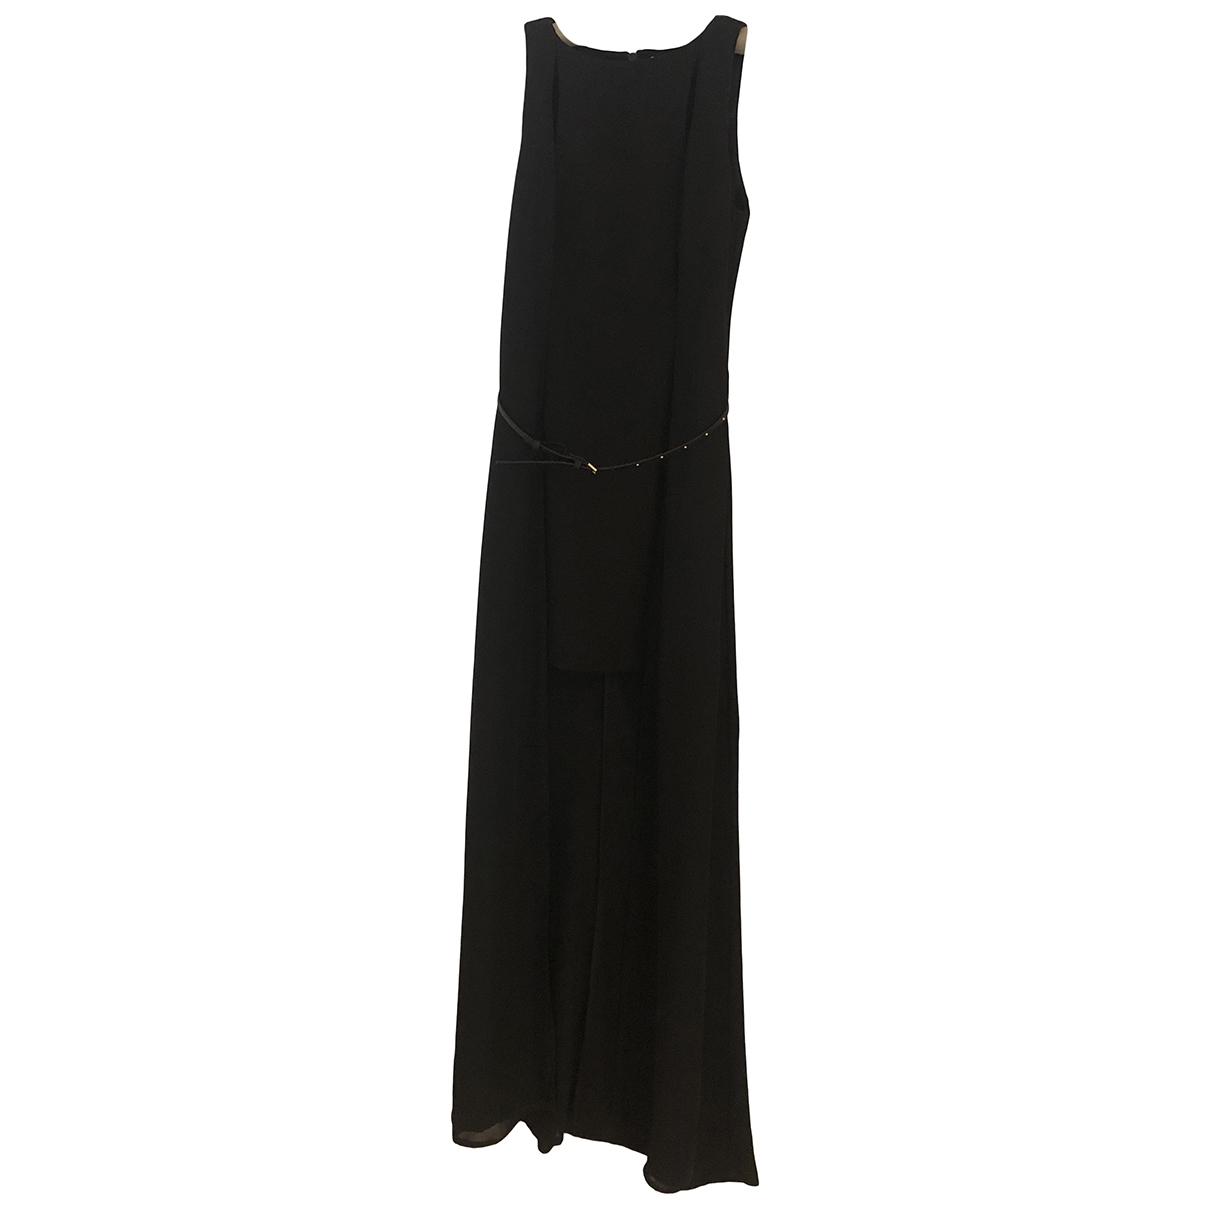 Halston Heritage \N Kleid in  Schwarz Baumwolle - Elasthan